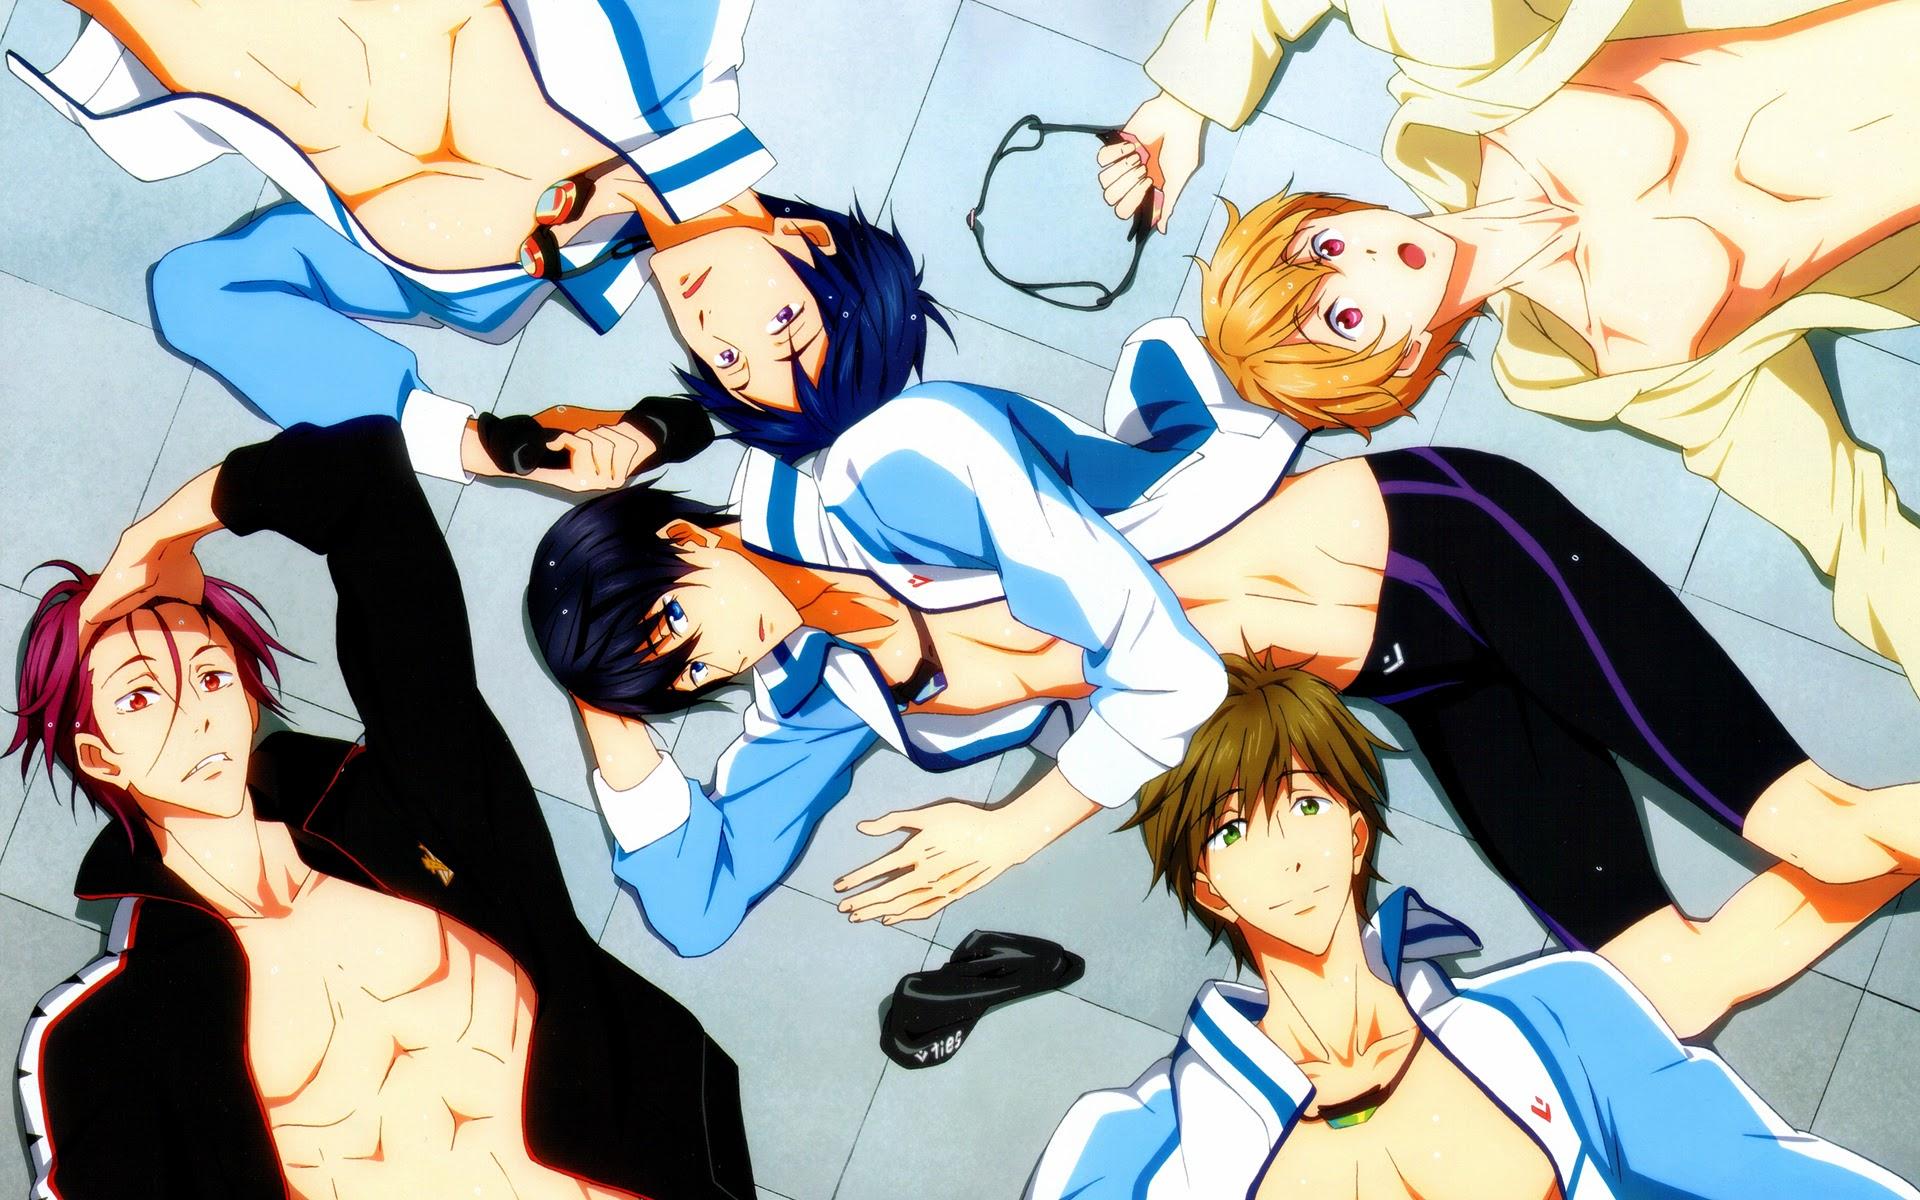 Iwatobi Swim Club Anime 04b HD Wallpaper 1920x1200